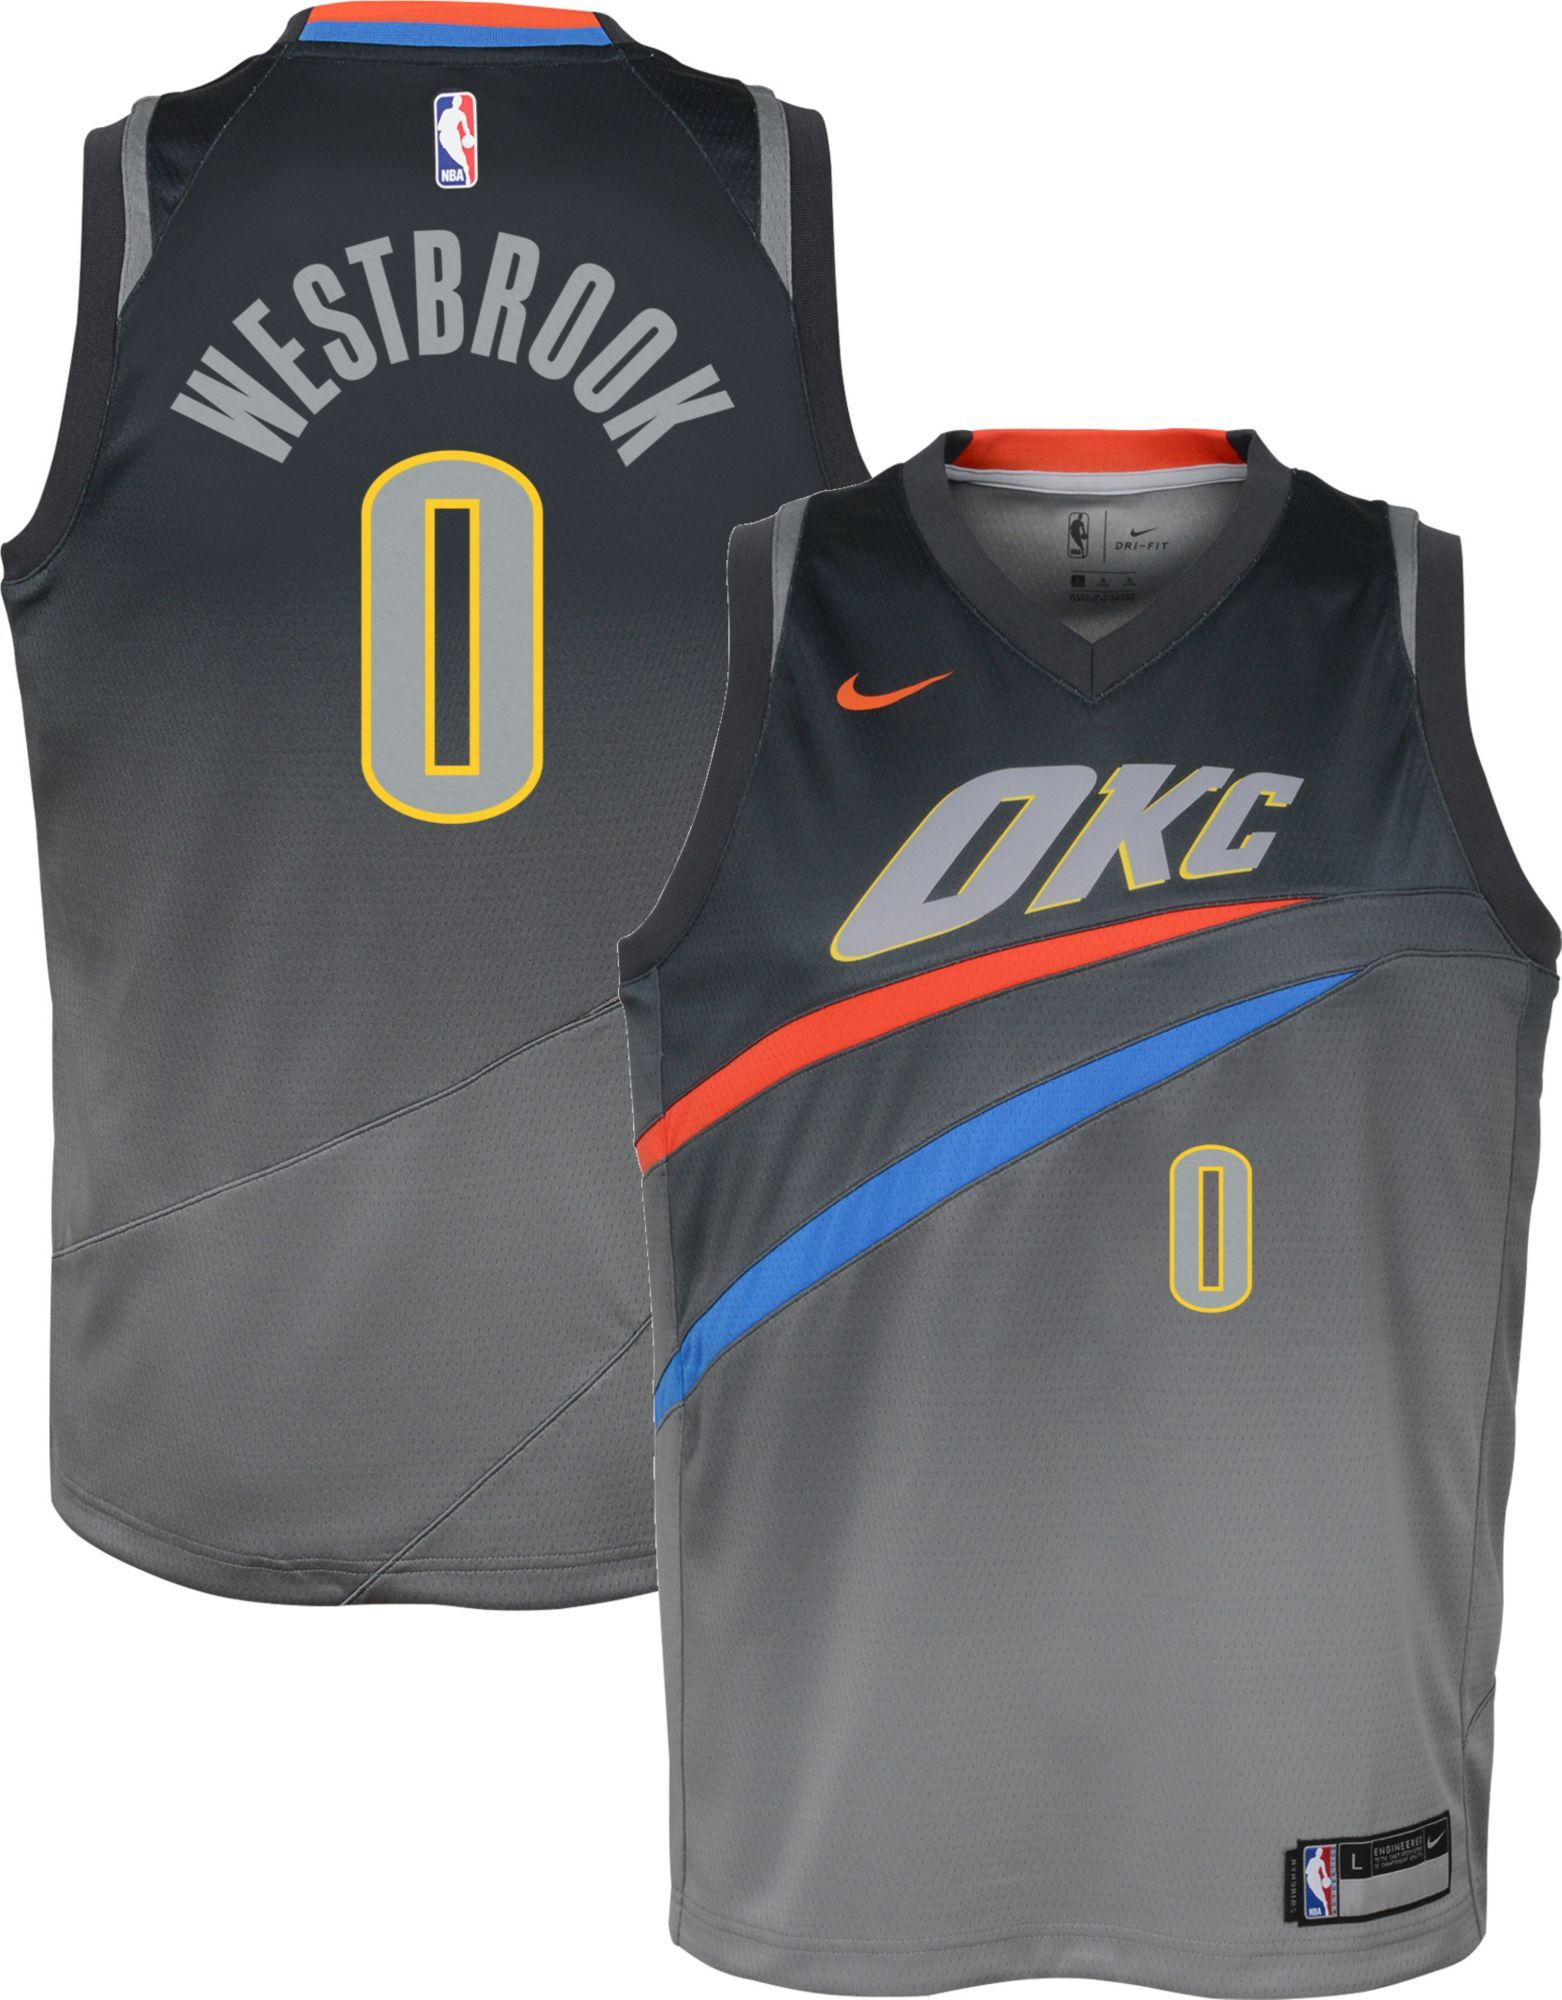 b7f1e0c05fc Nike Youth Oklahoma City Thunder Russell Westbrook Dri-FIT City Edition  Swingman Jersey, Size: Medium, Multi